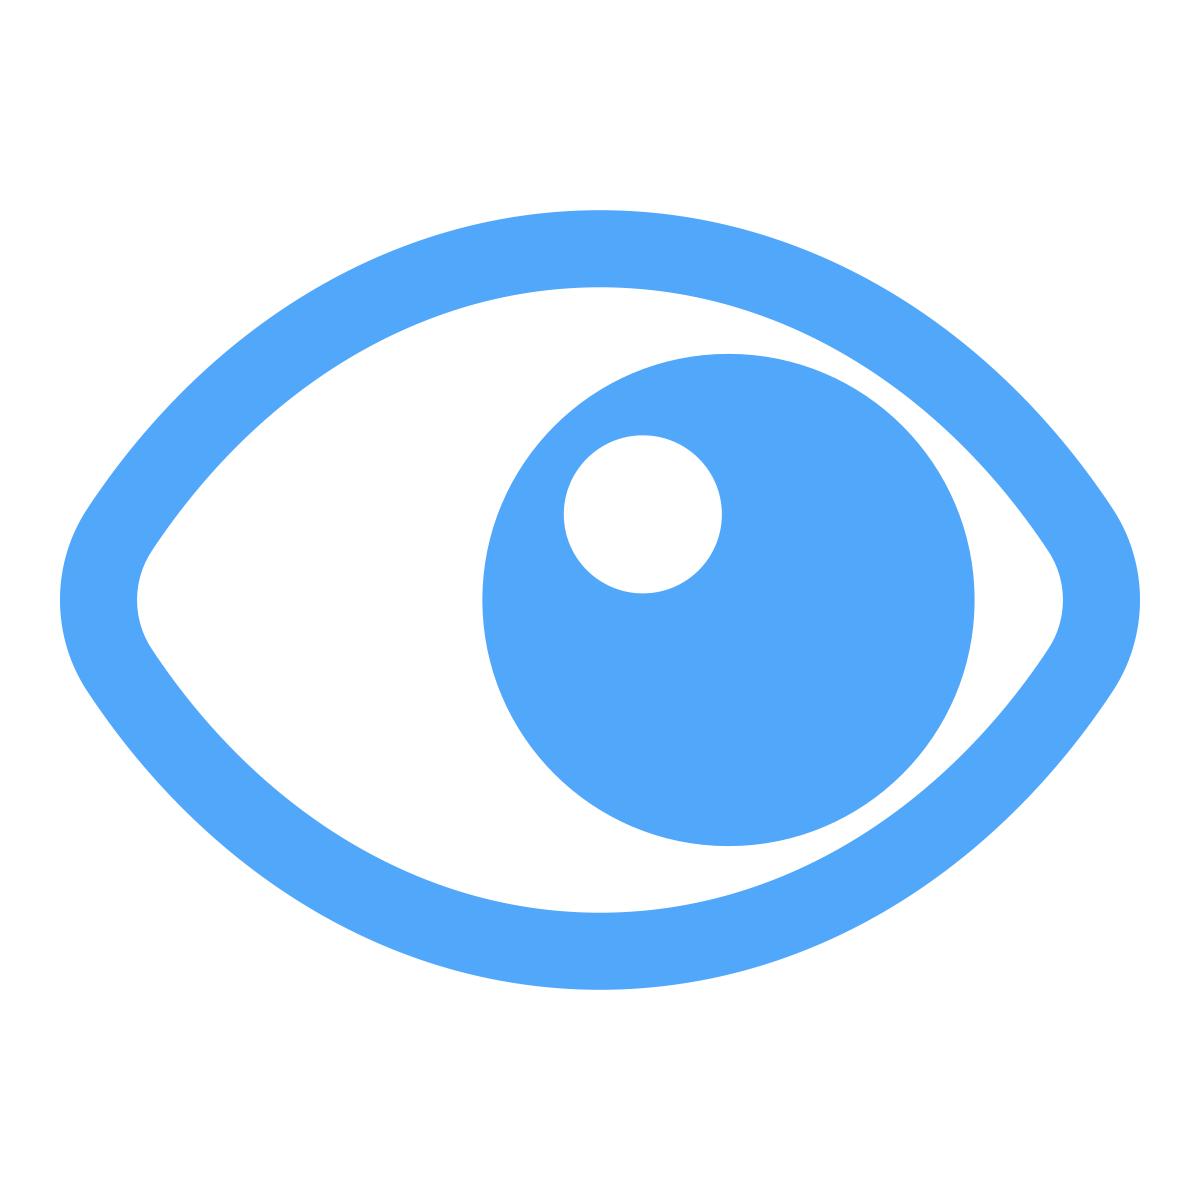 task object naming noun_1339645_51A7F9.png